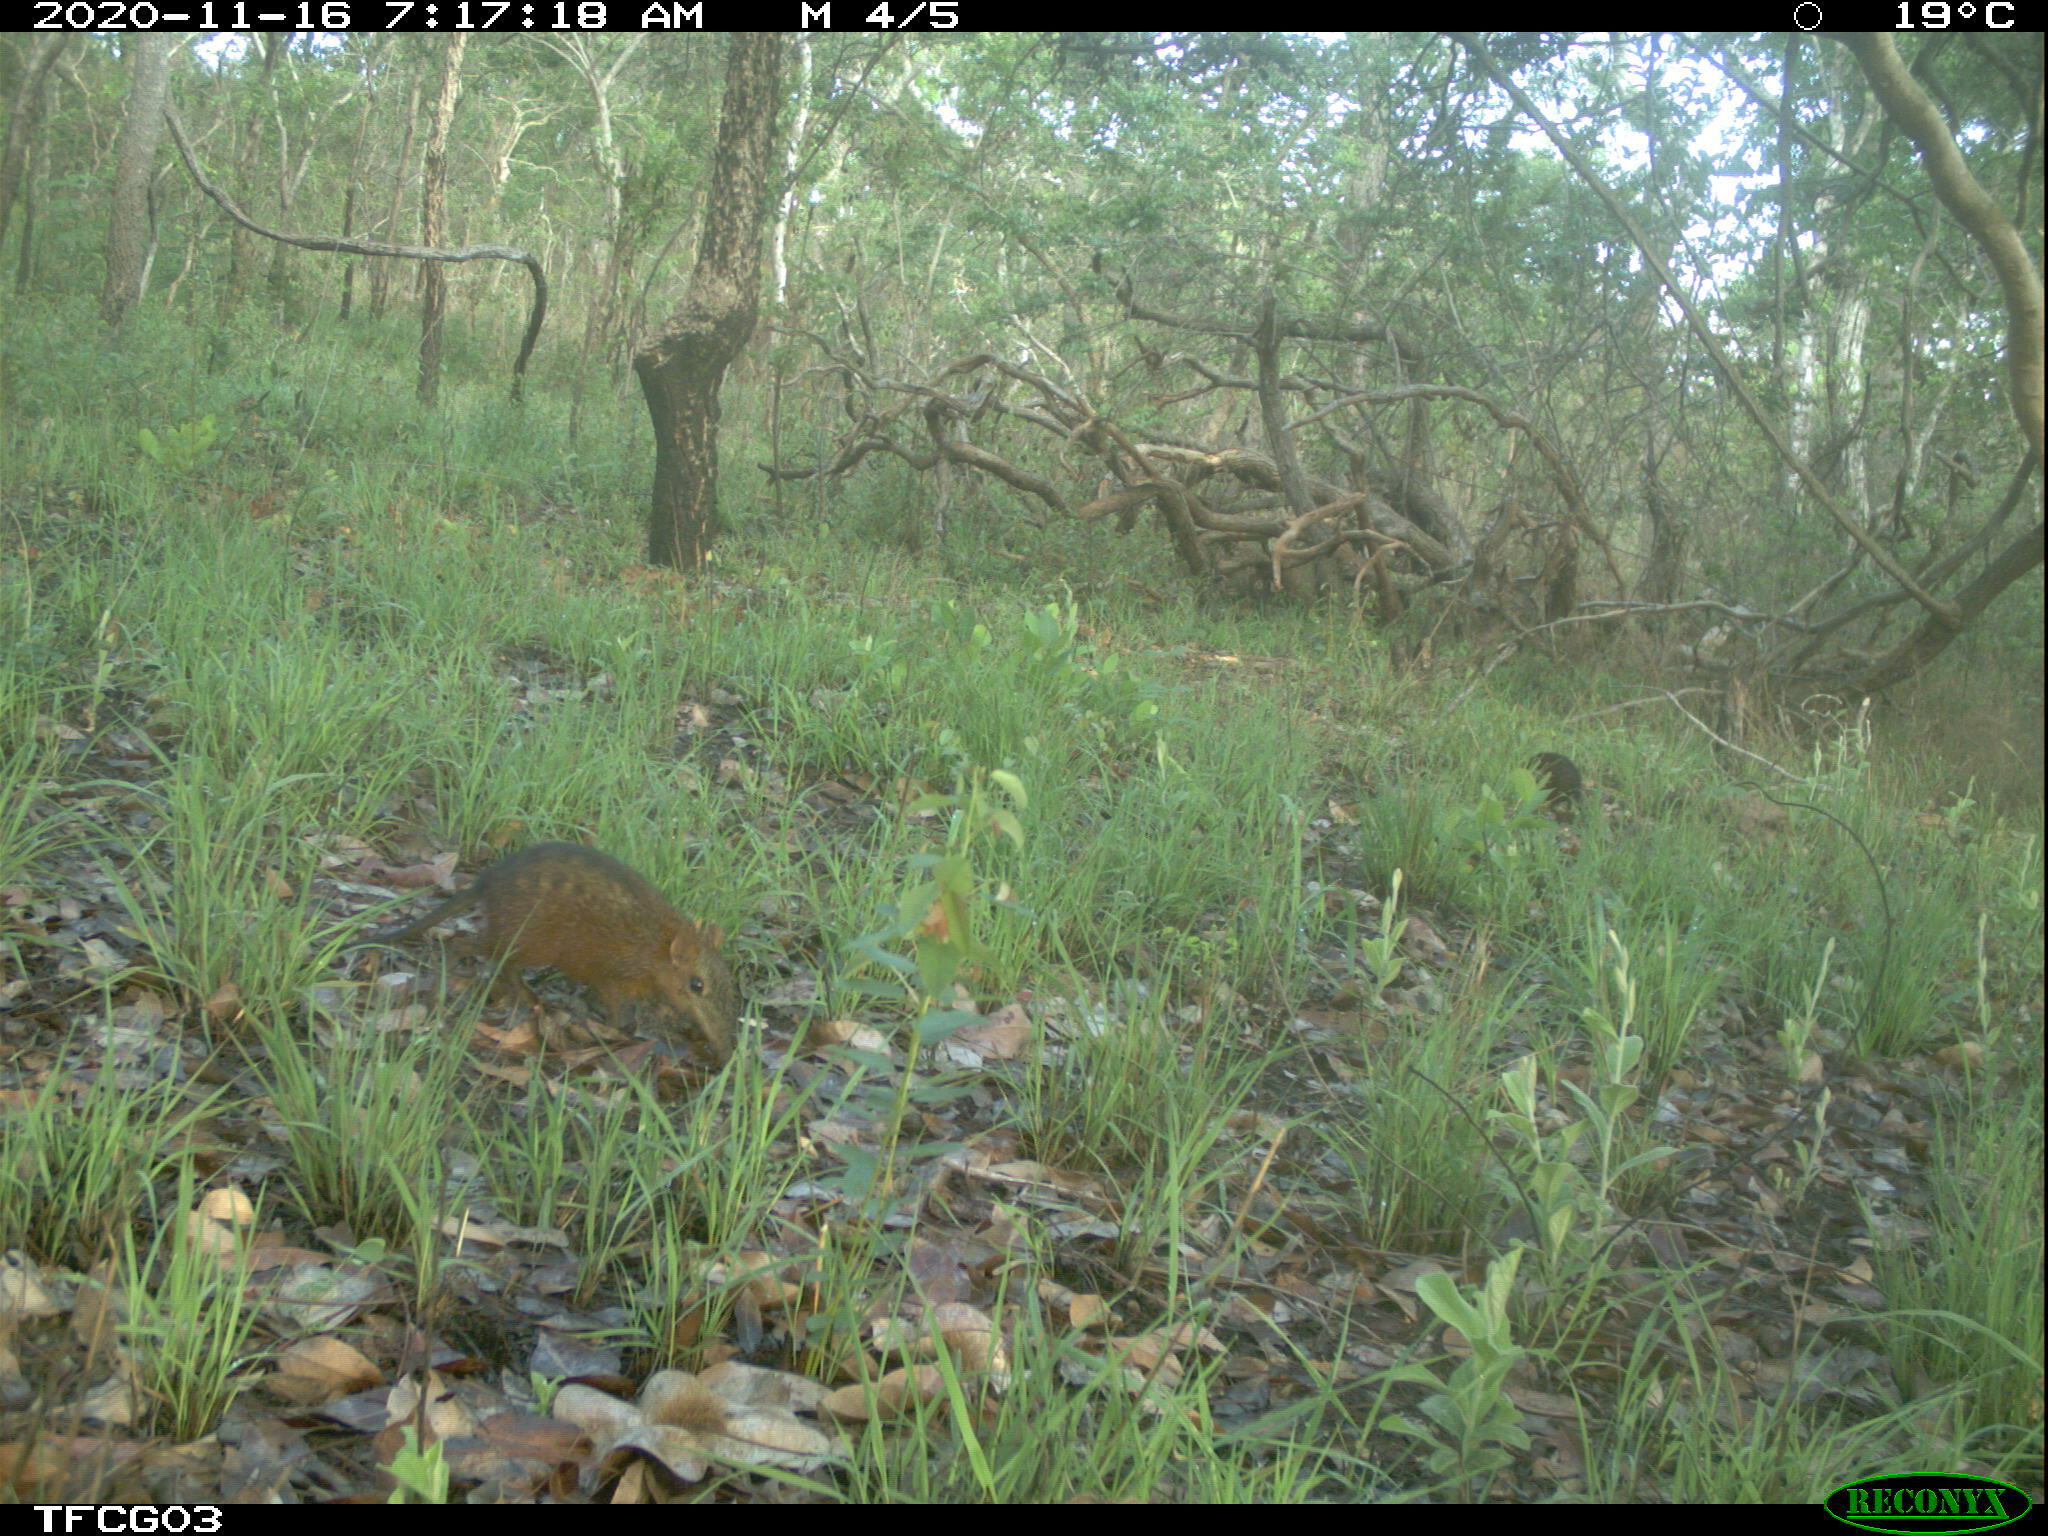 Chequered Elephant Shrew